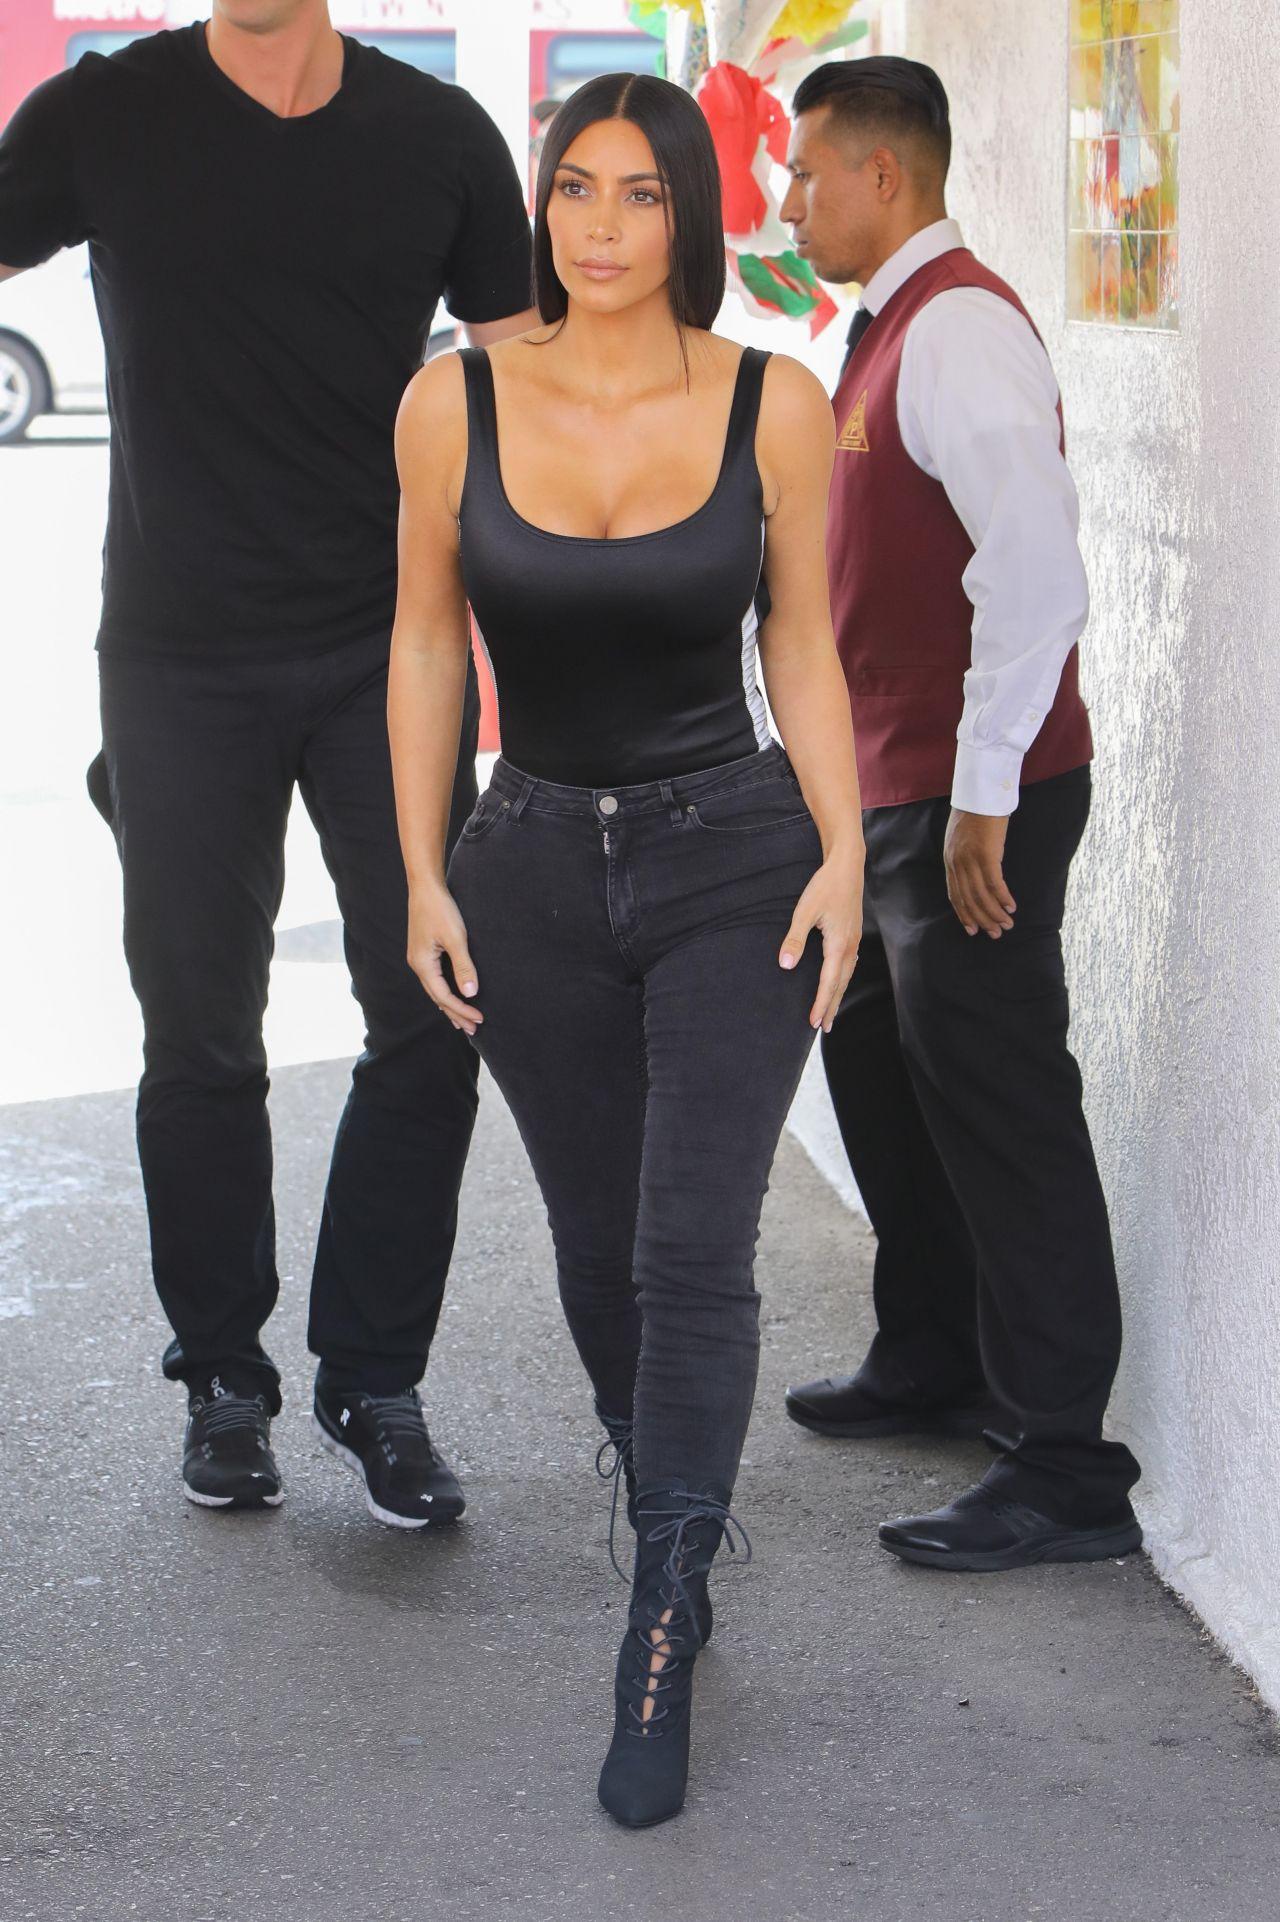 Kim Kardashian Cinco De Mayo At Casa Vega In Los Angeles 05 05 2017